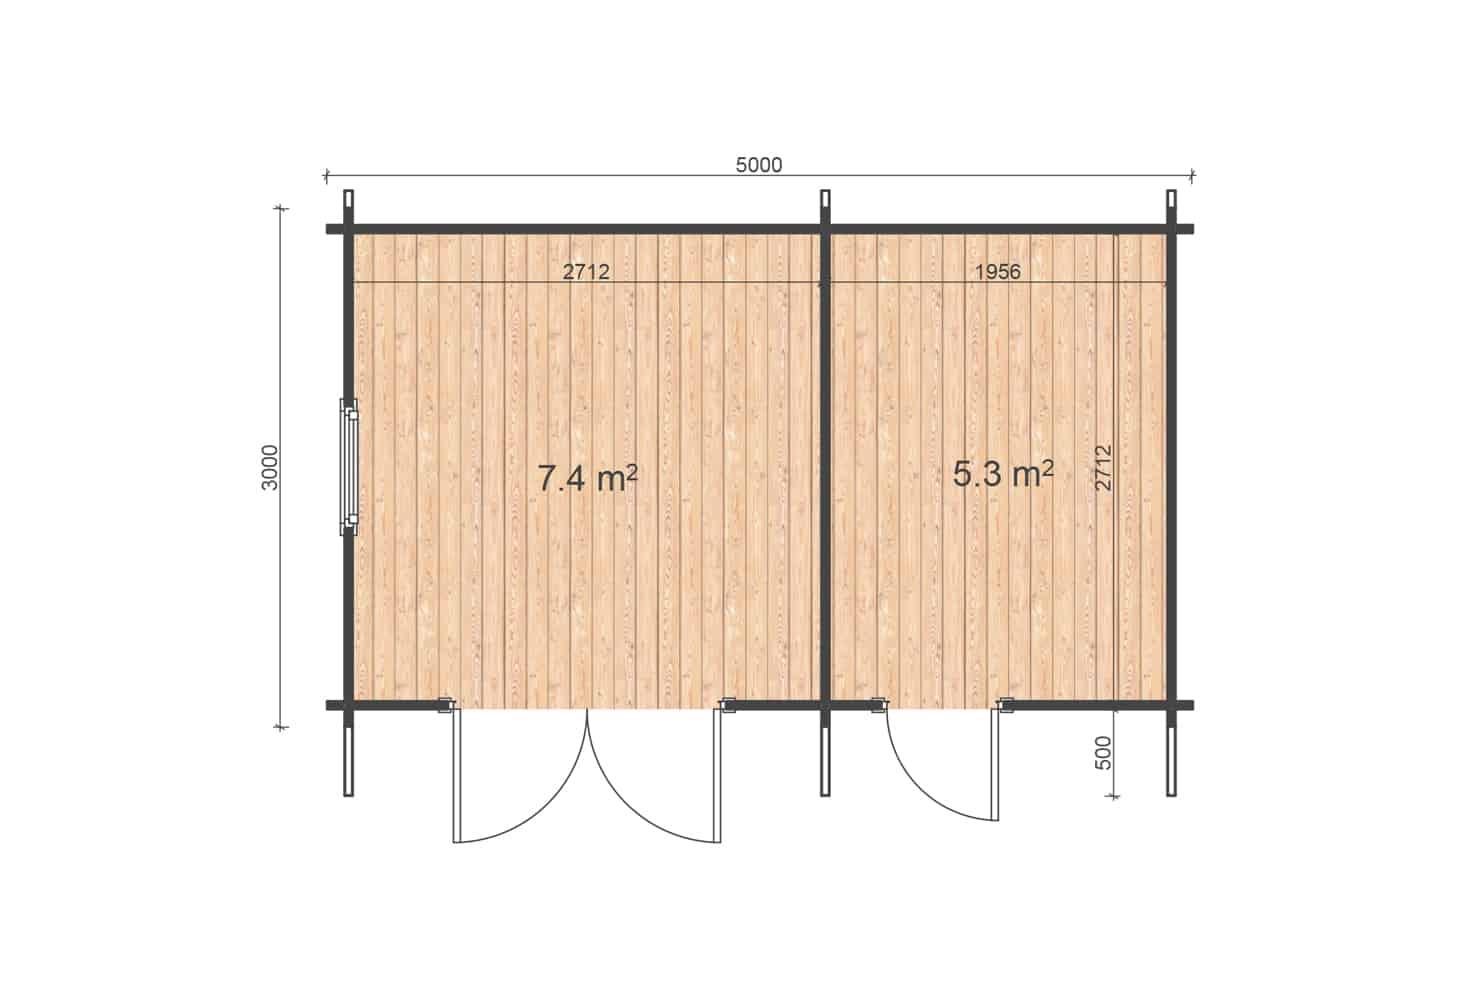 Vaucluse 5x3 floor plan